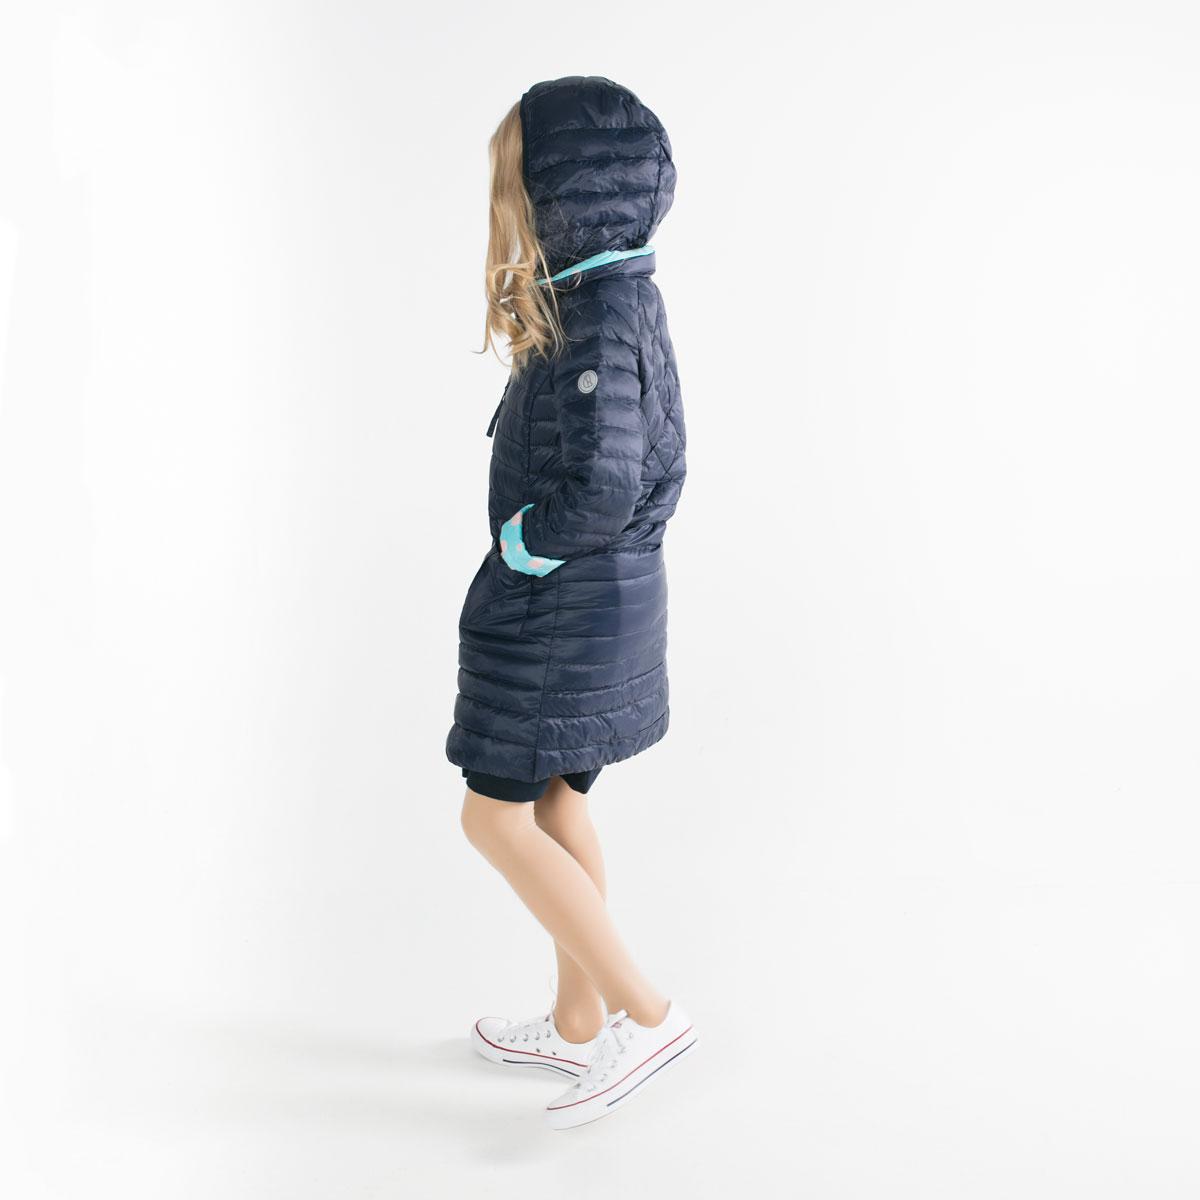 Pengu KIDS ultra light down coat in dark blue